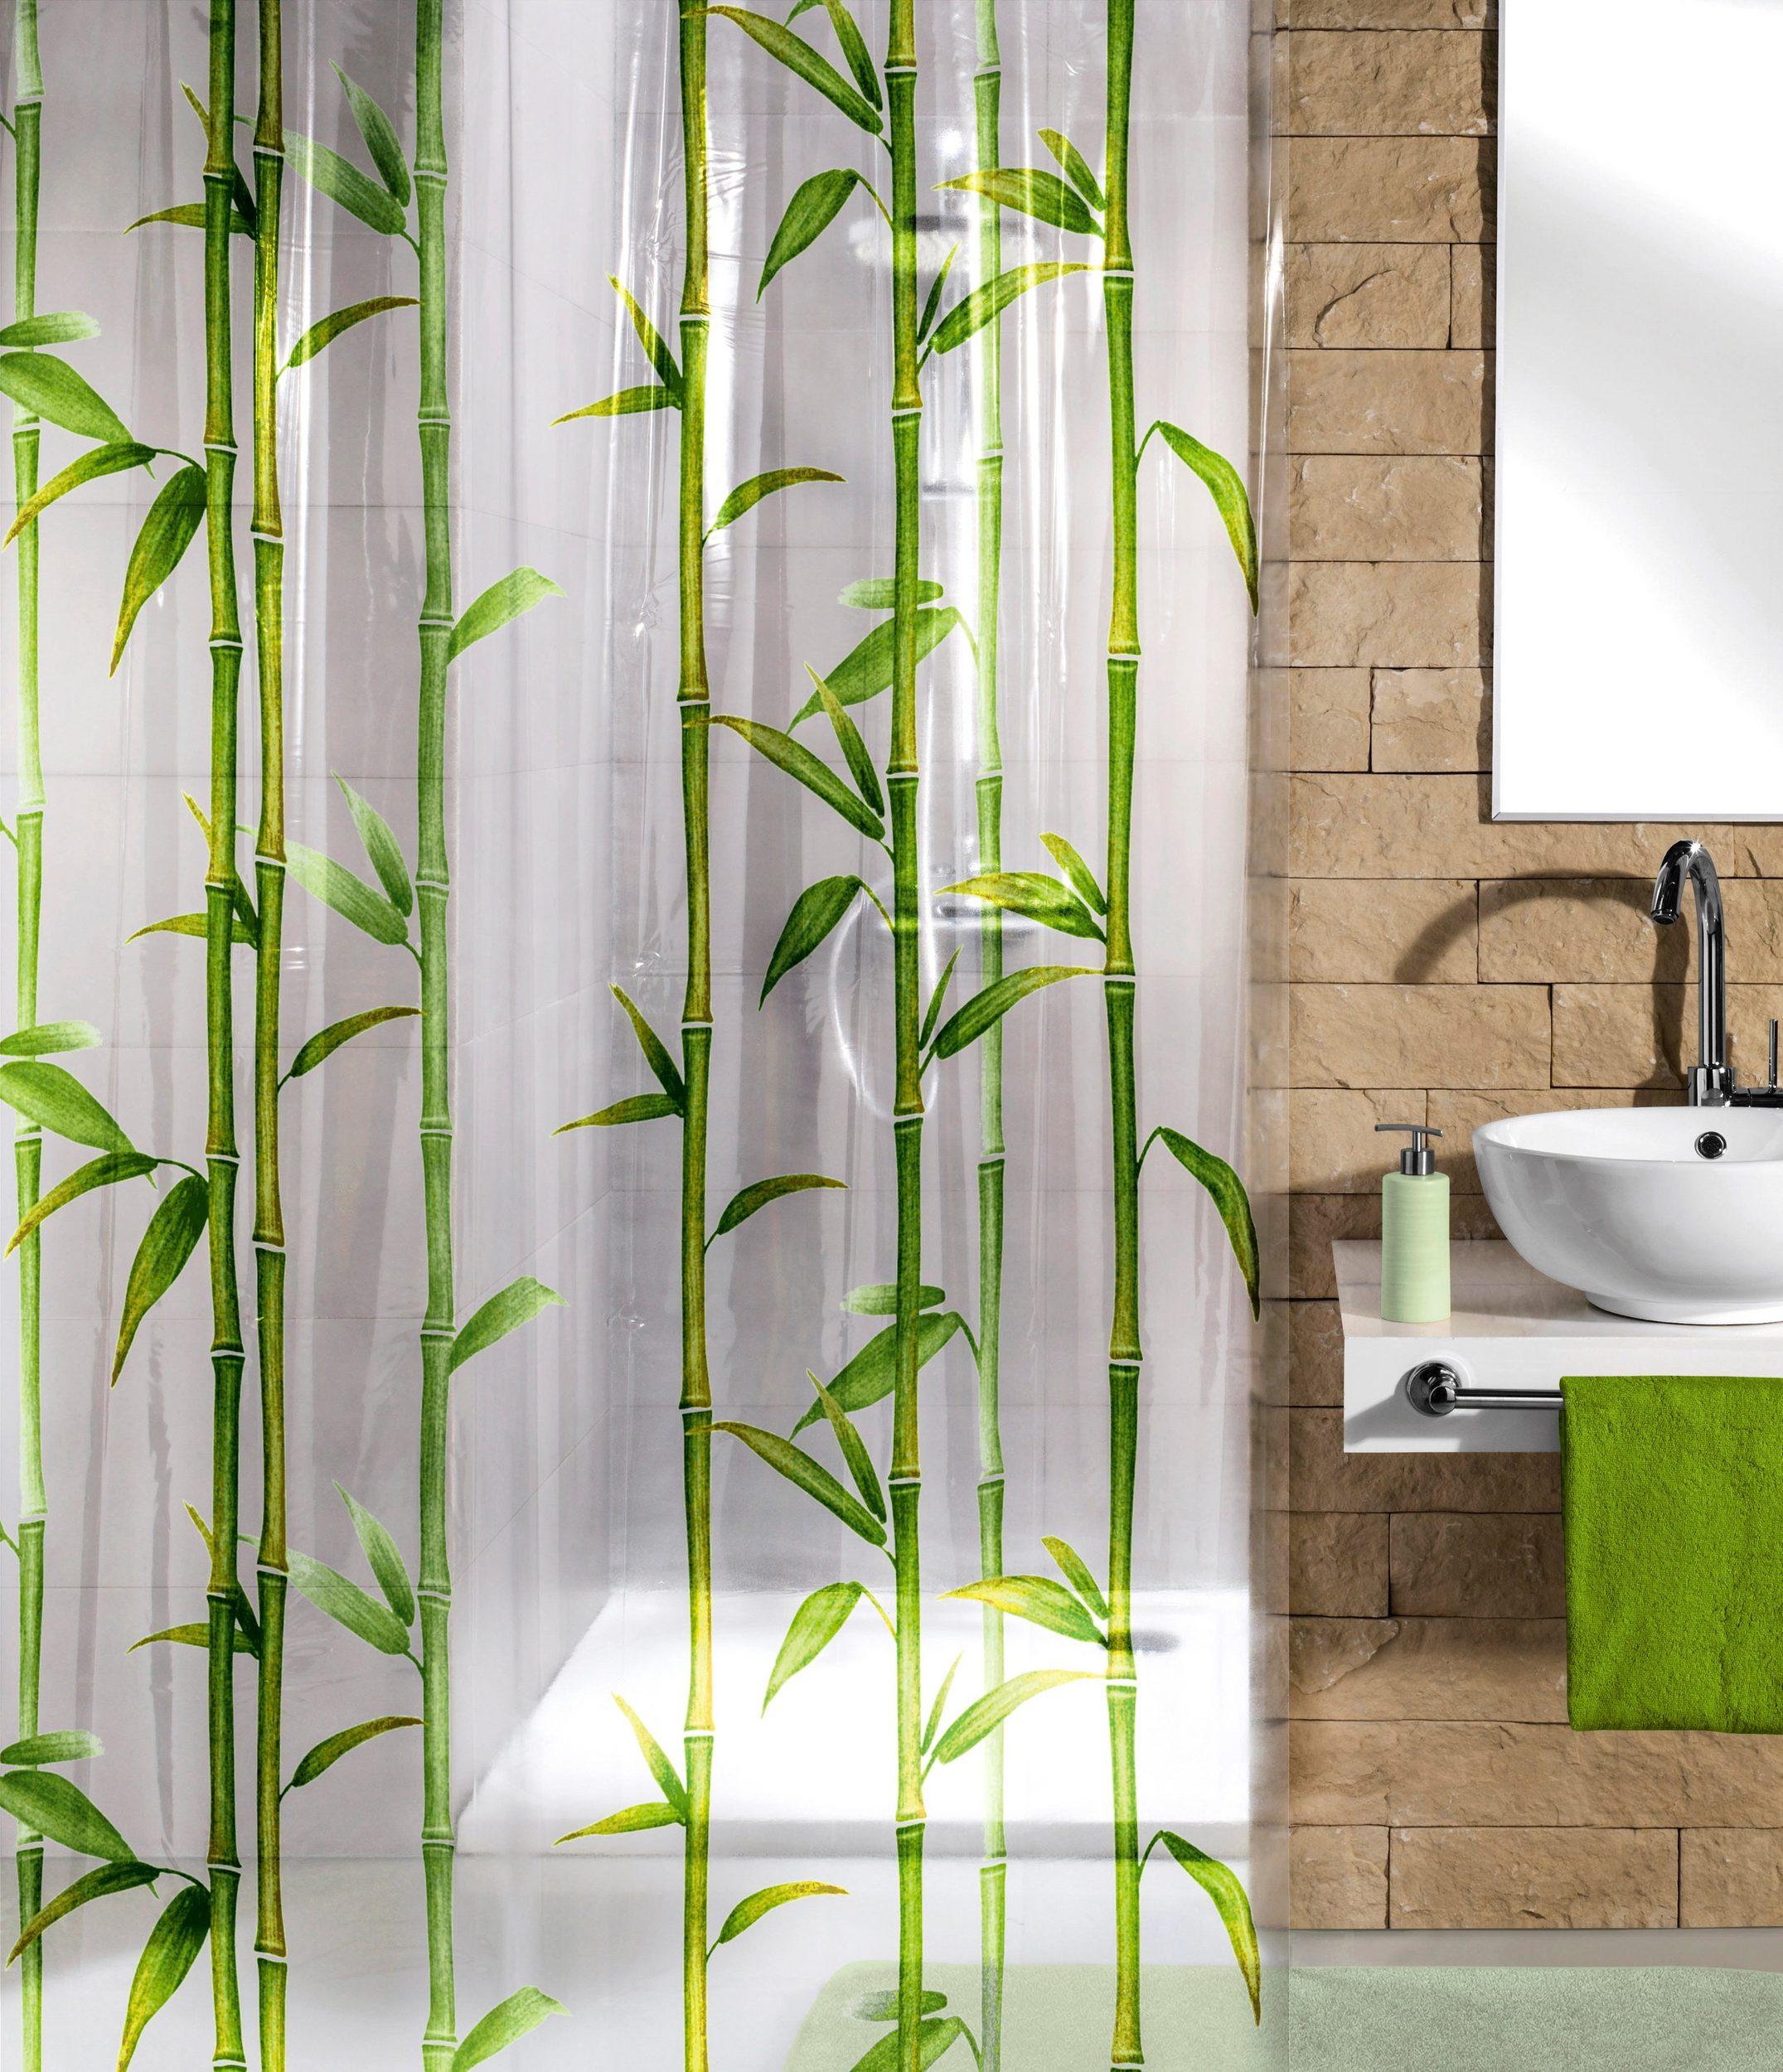 Duschvorhang Vorhang Bamboo Bambus-Print Peva ohne Ringe 7240142